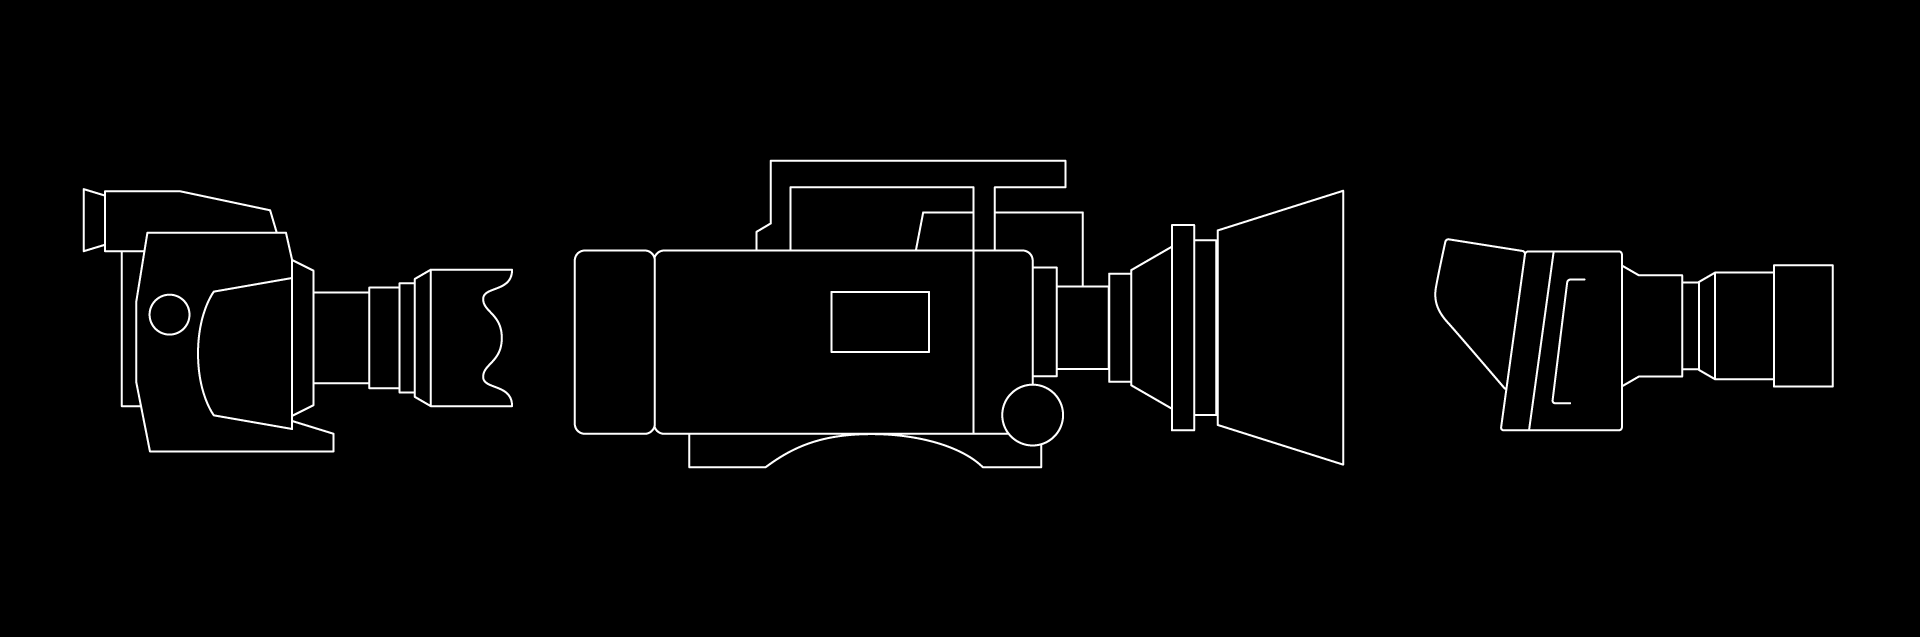 KOJI-camera-formats